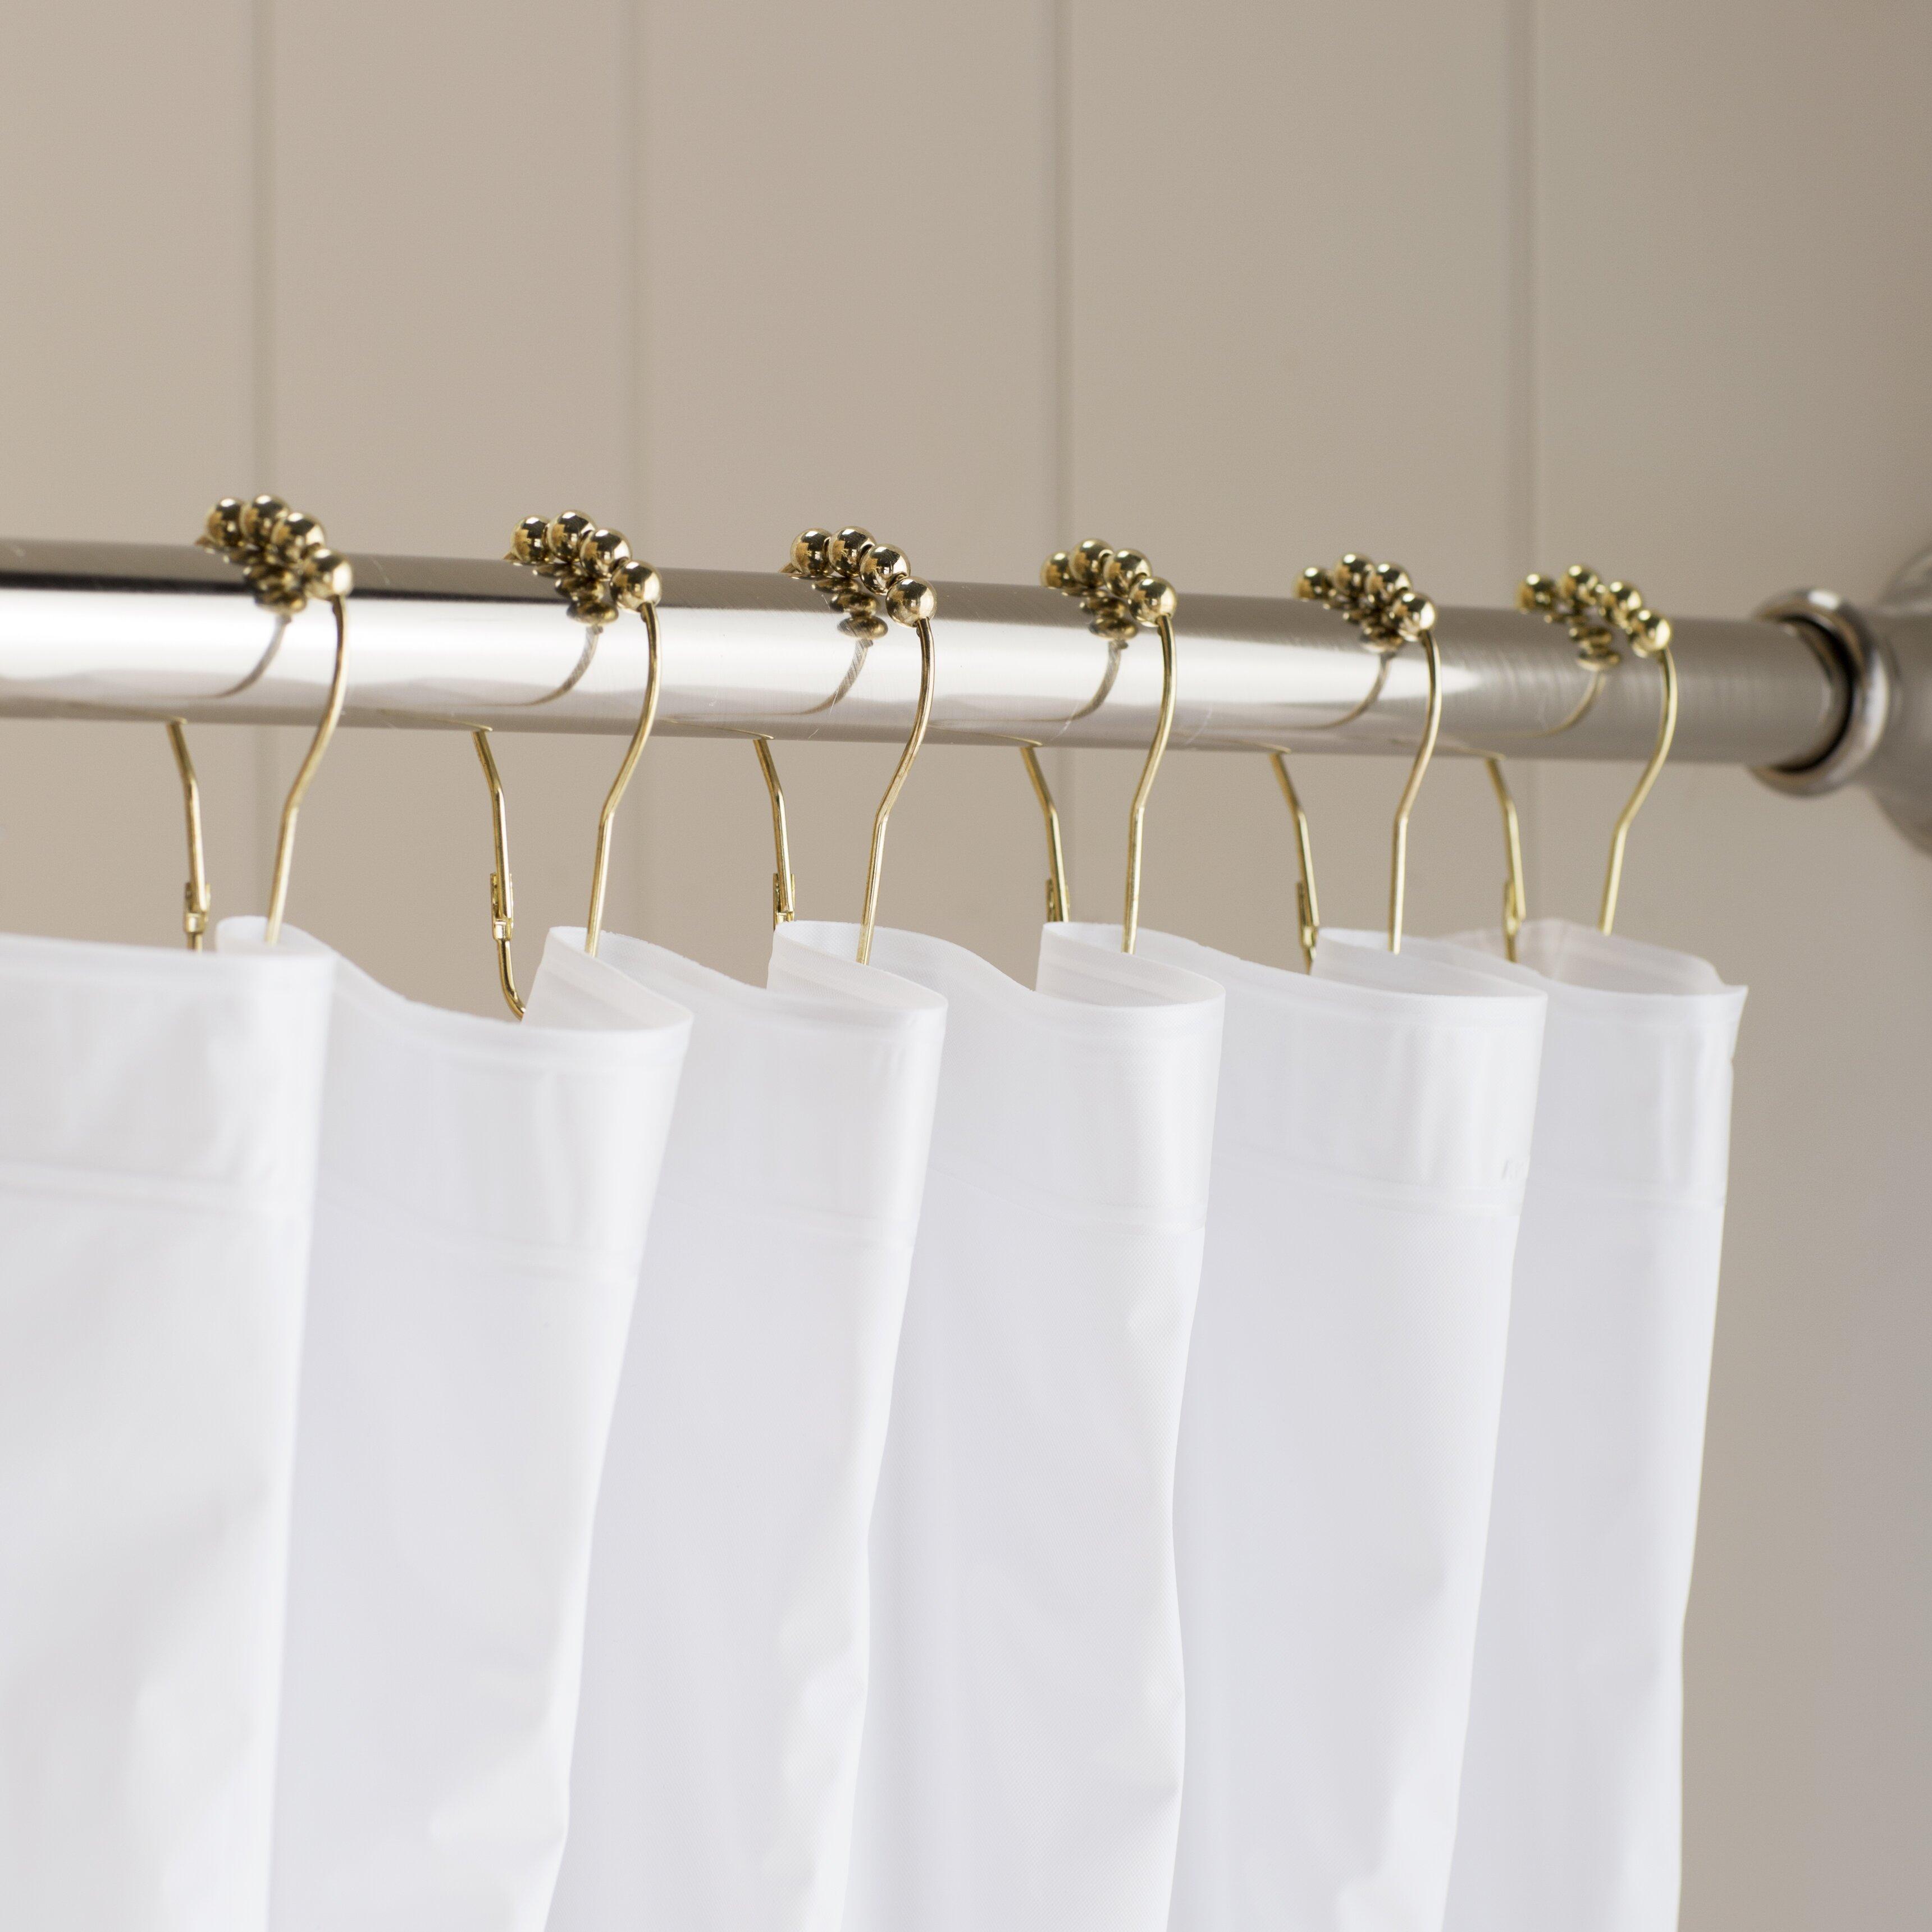 Rhinestone shower curtain hooks - Rhinestone Shower Curtain Hooks Shower Curtain Hooks Wayfair Basics Gavin Shower Curtain Hooks